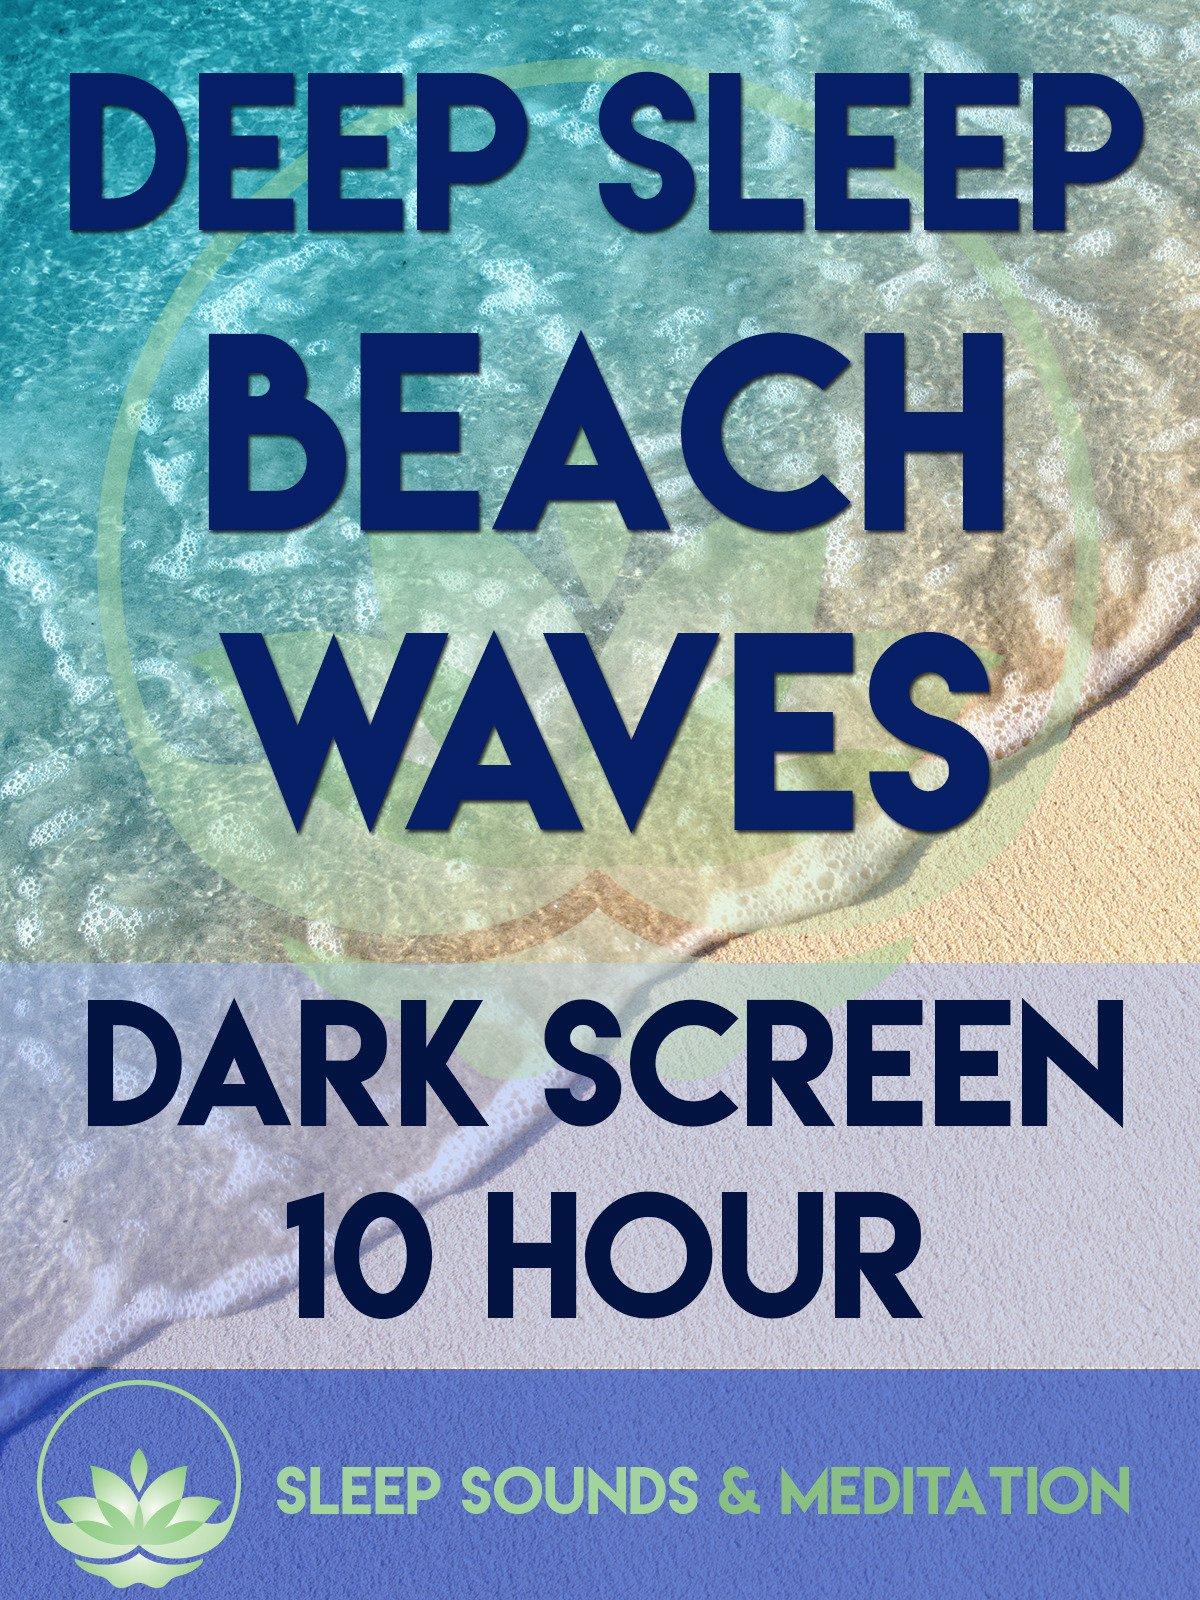 Deep Sleep Beach Waves, Dark Screen 10 Hour